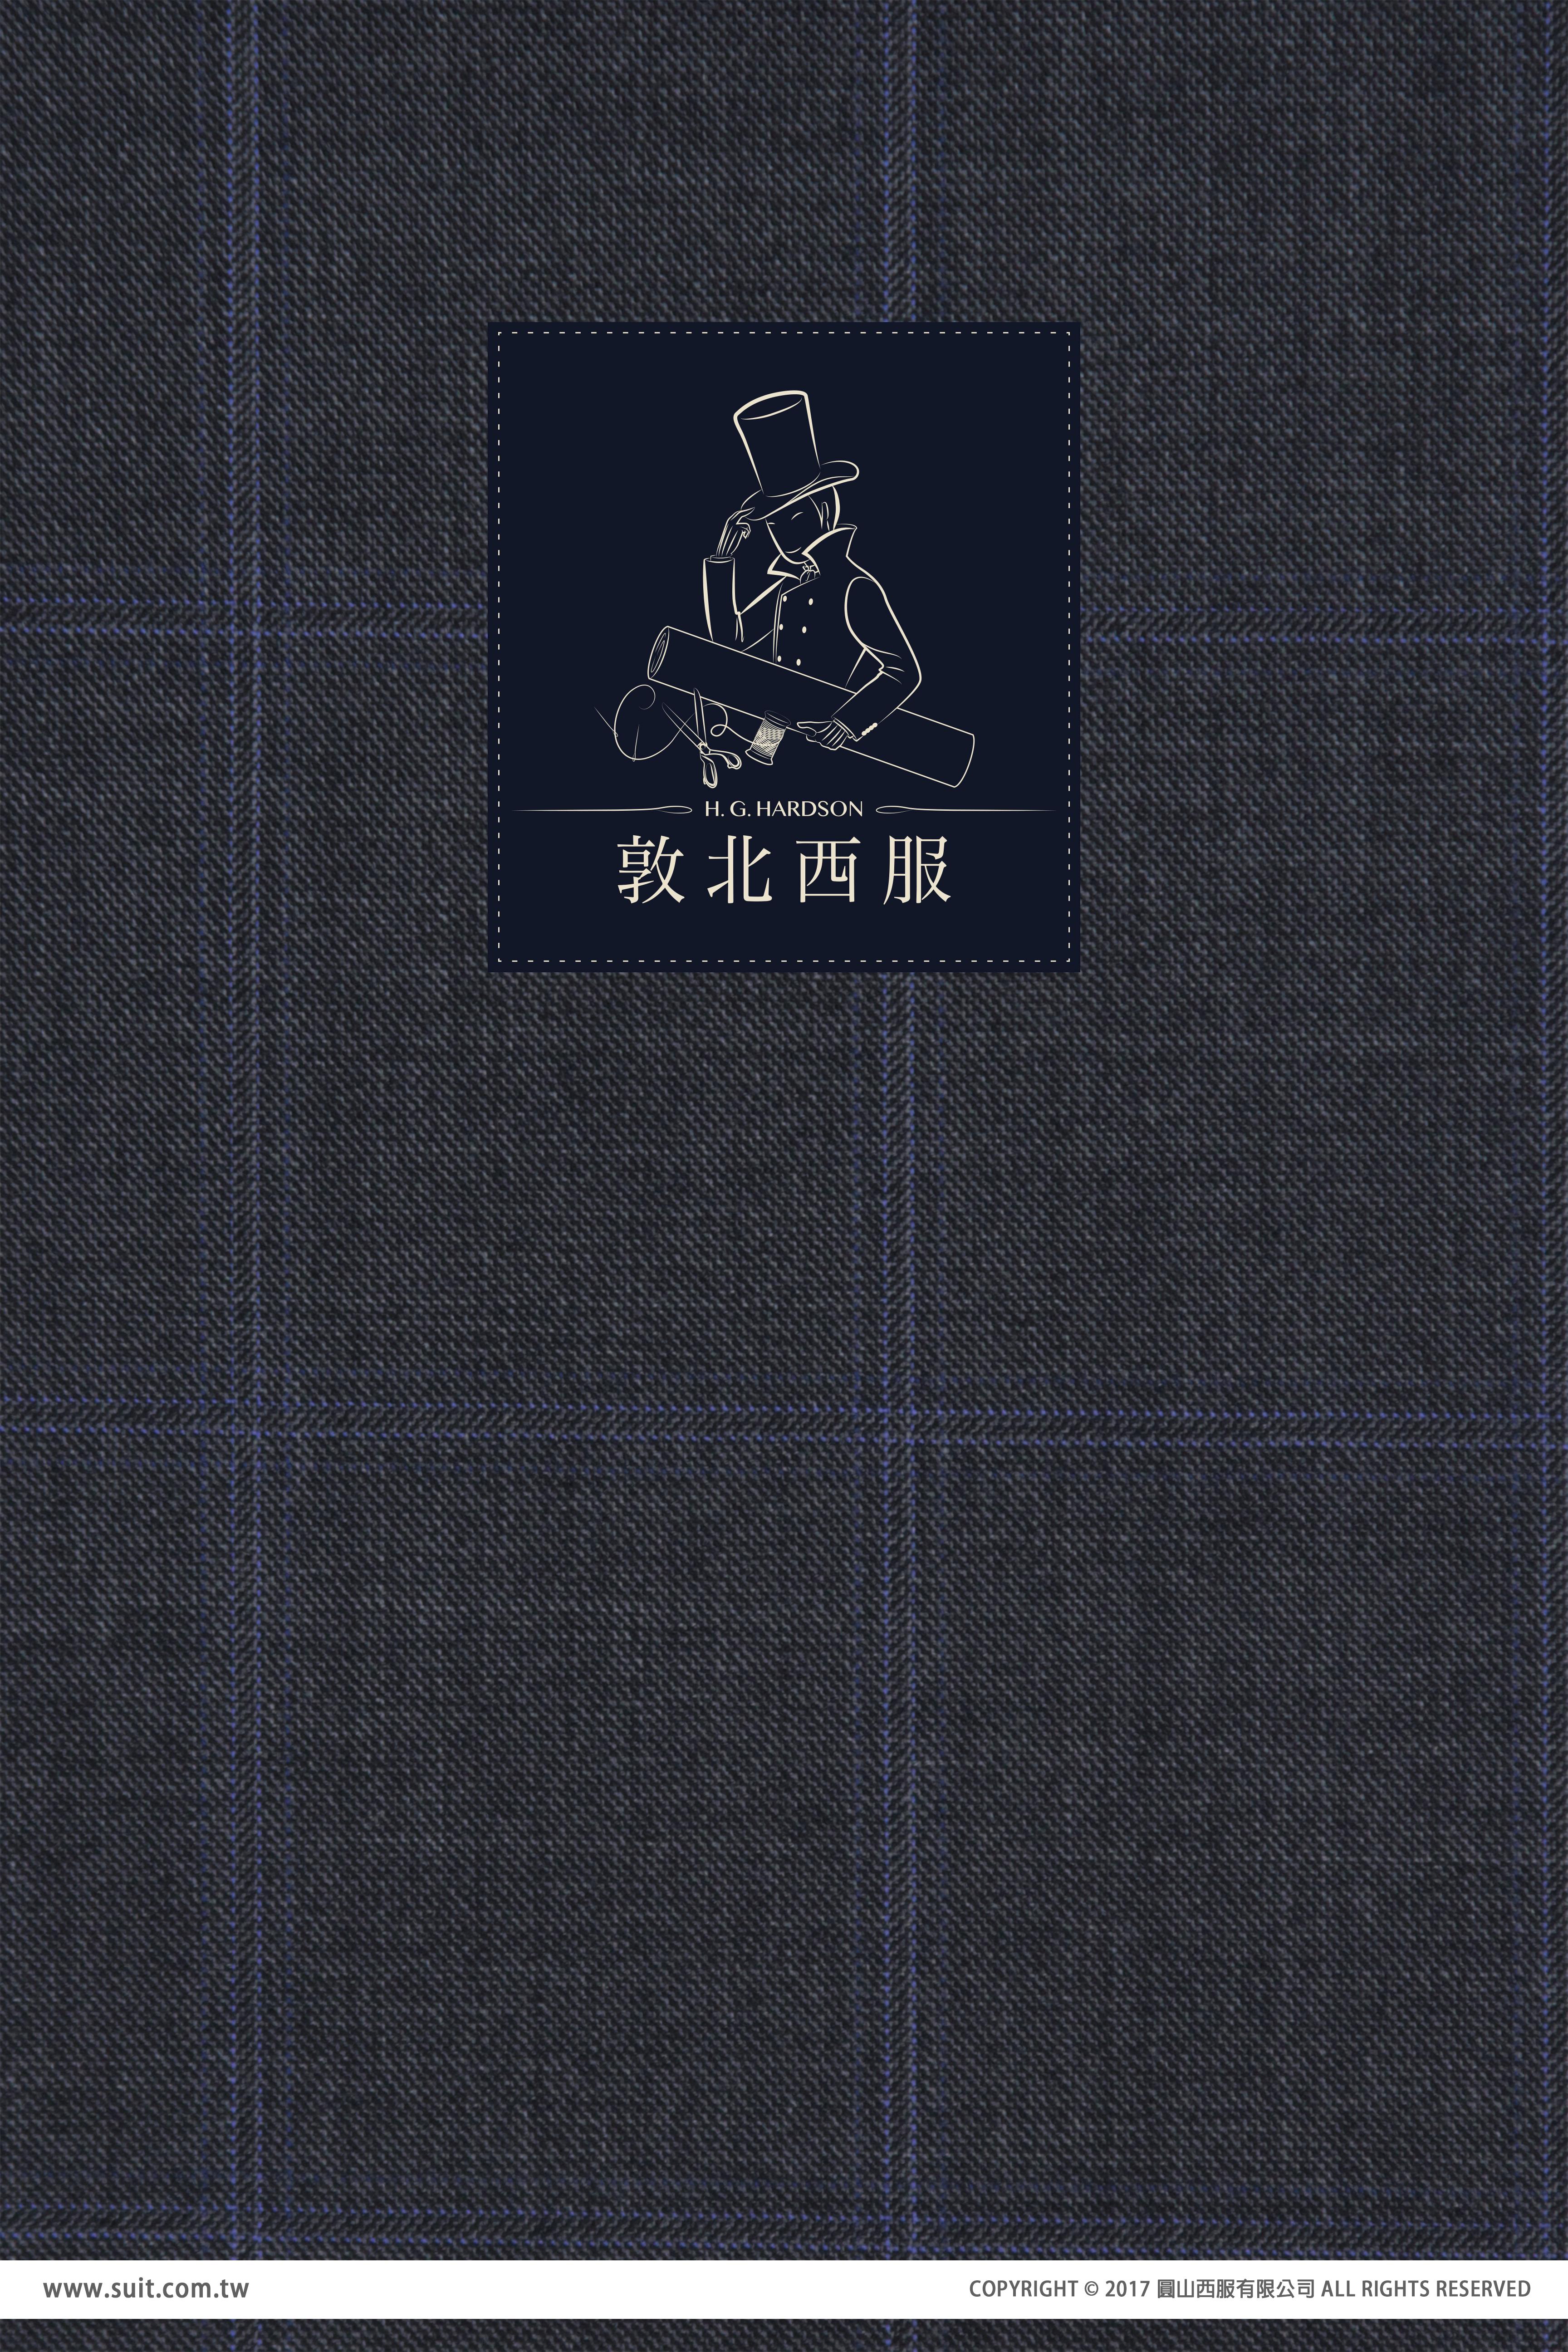 1800-67770